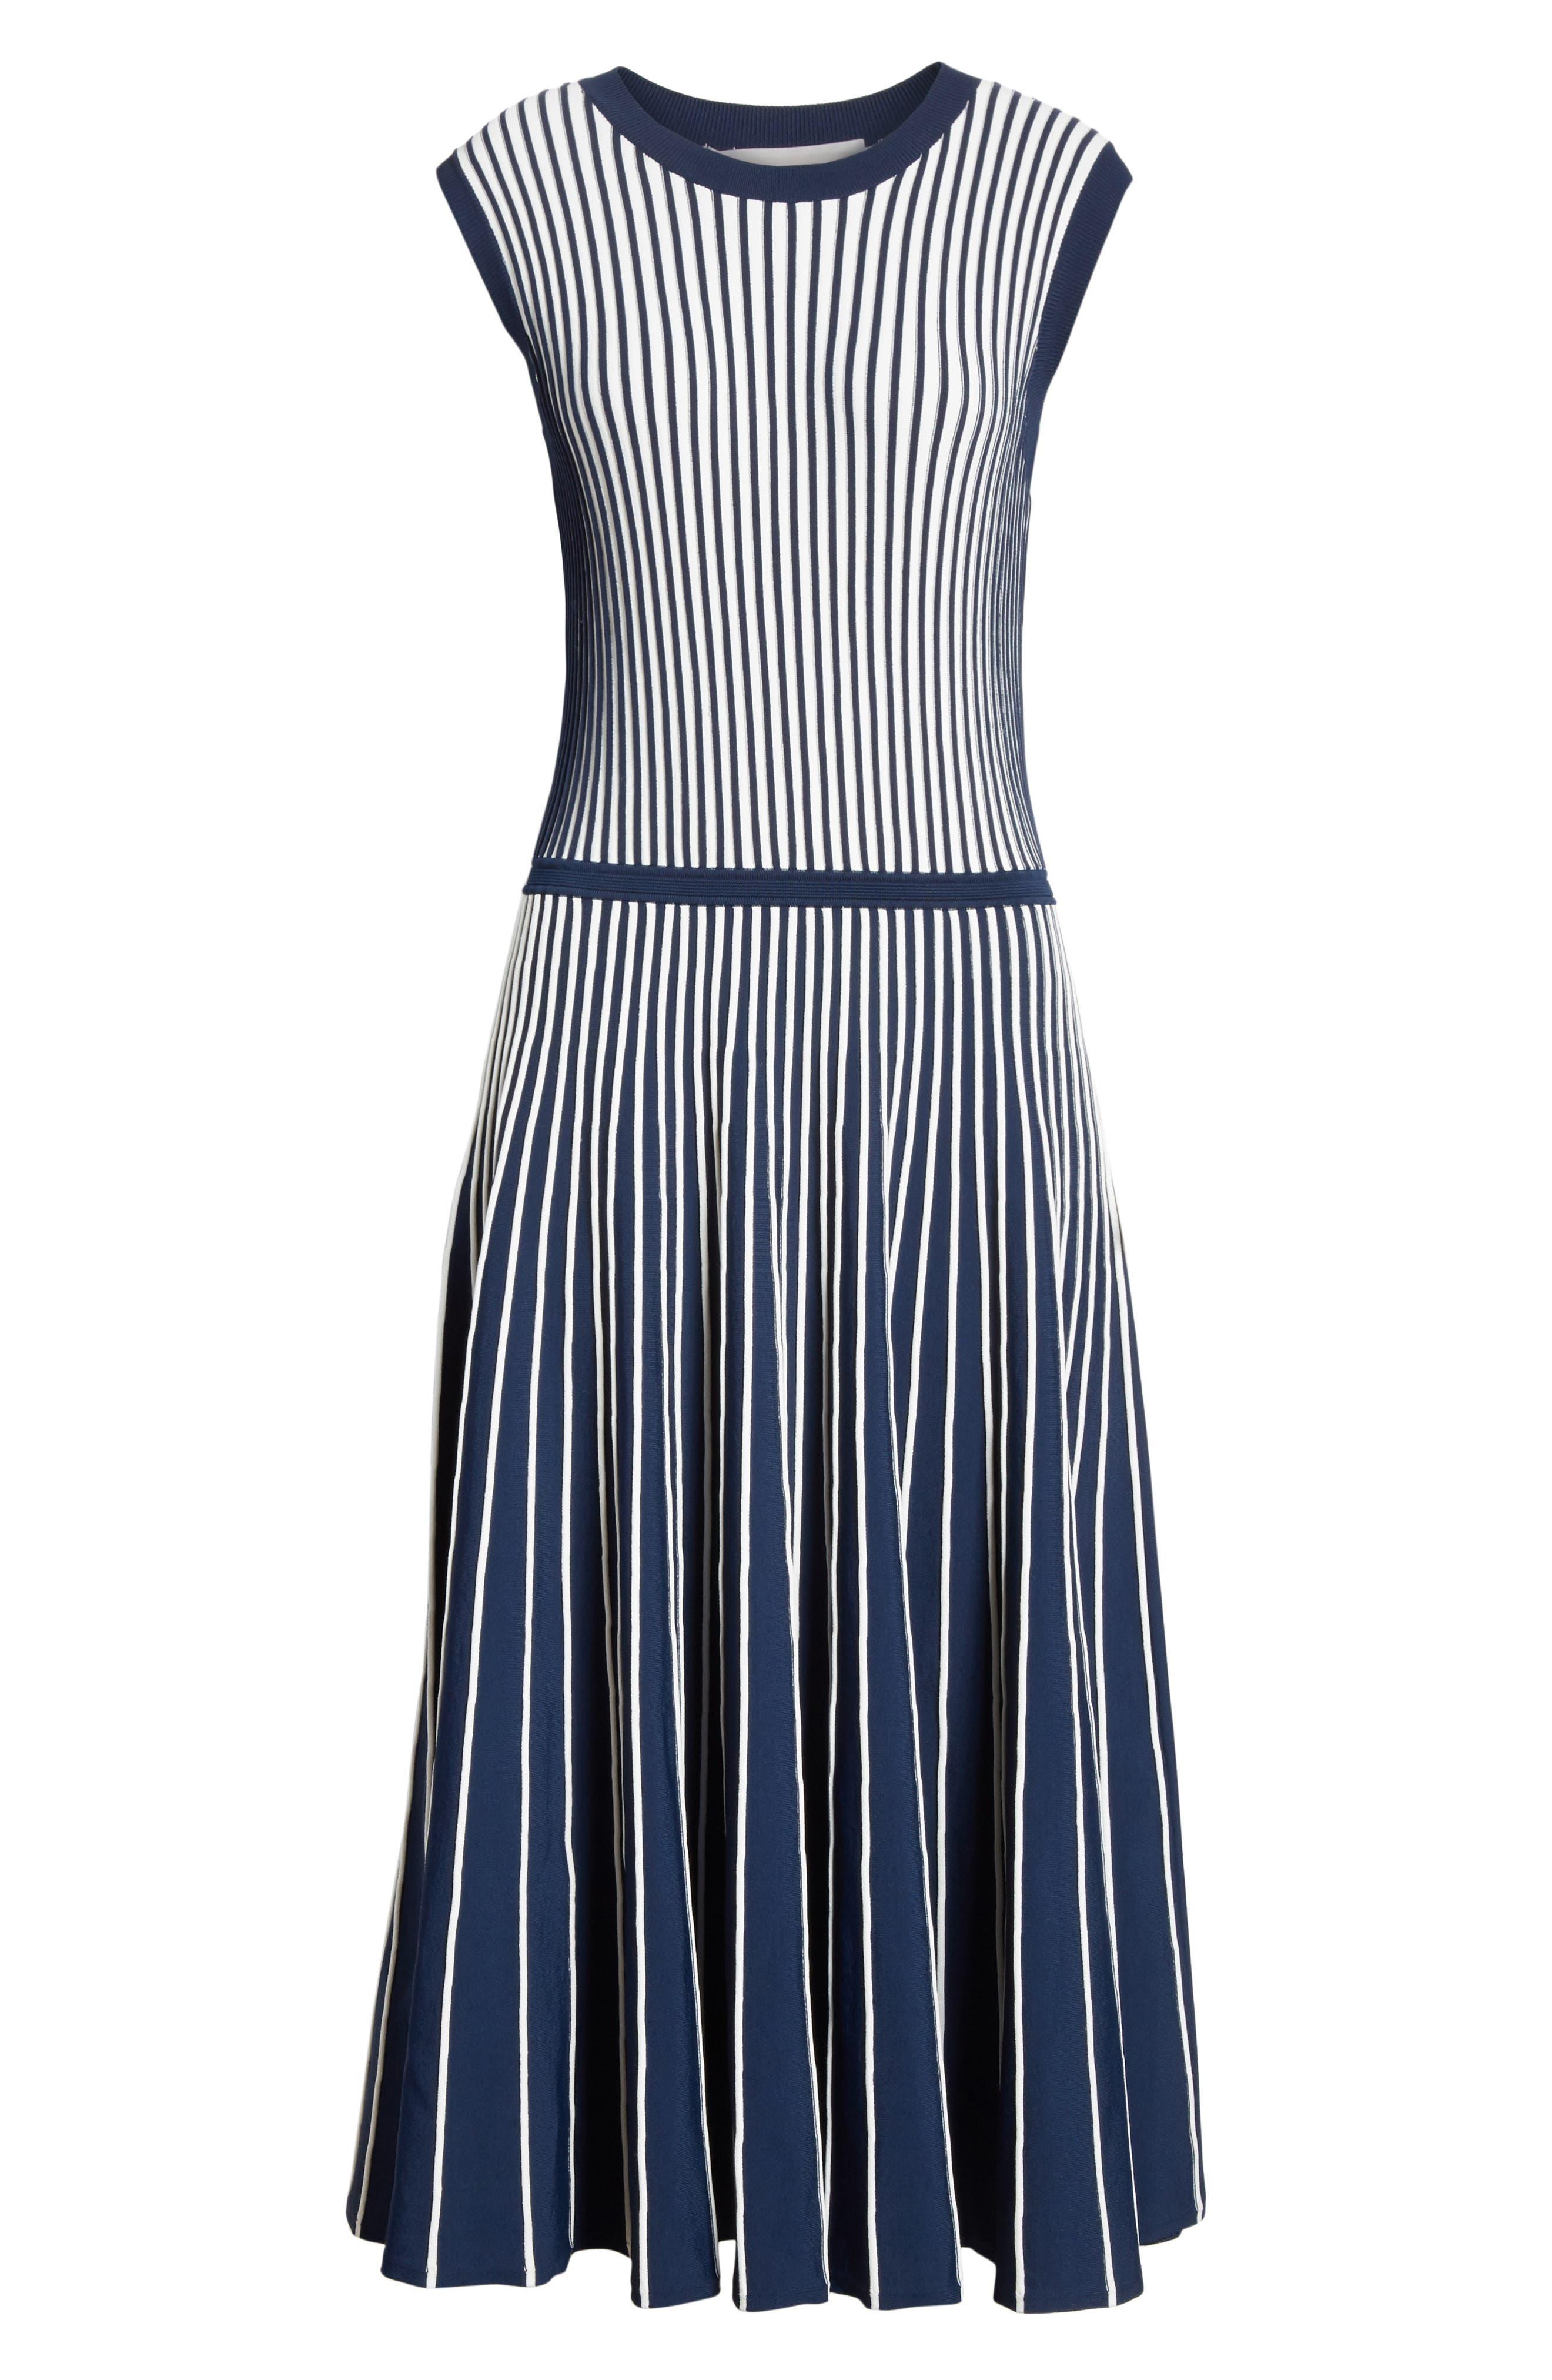 Stripe Knit Day Dress,                             Alternate thumbnail 6, color,                             453